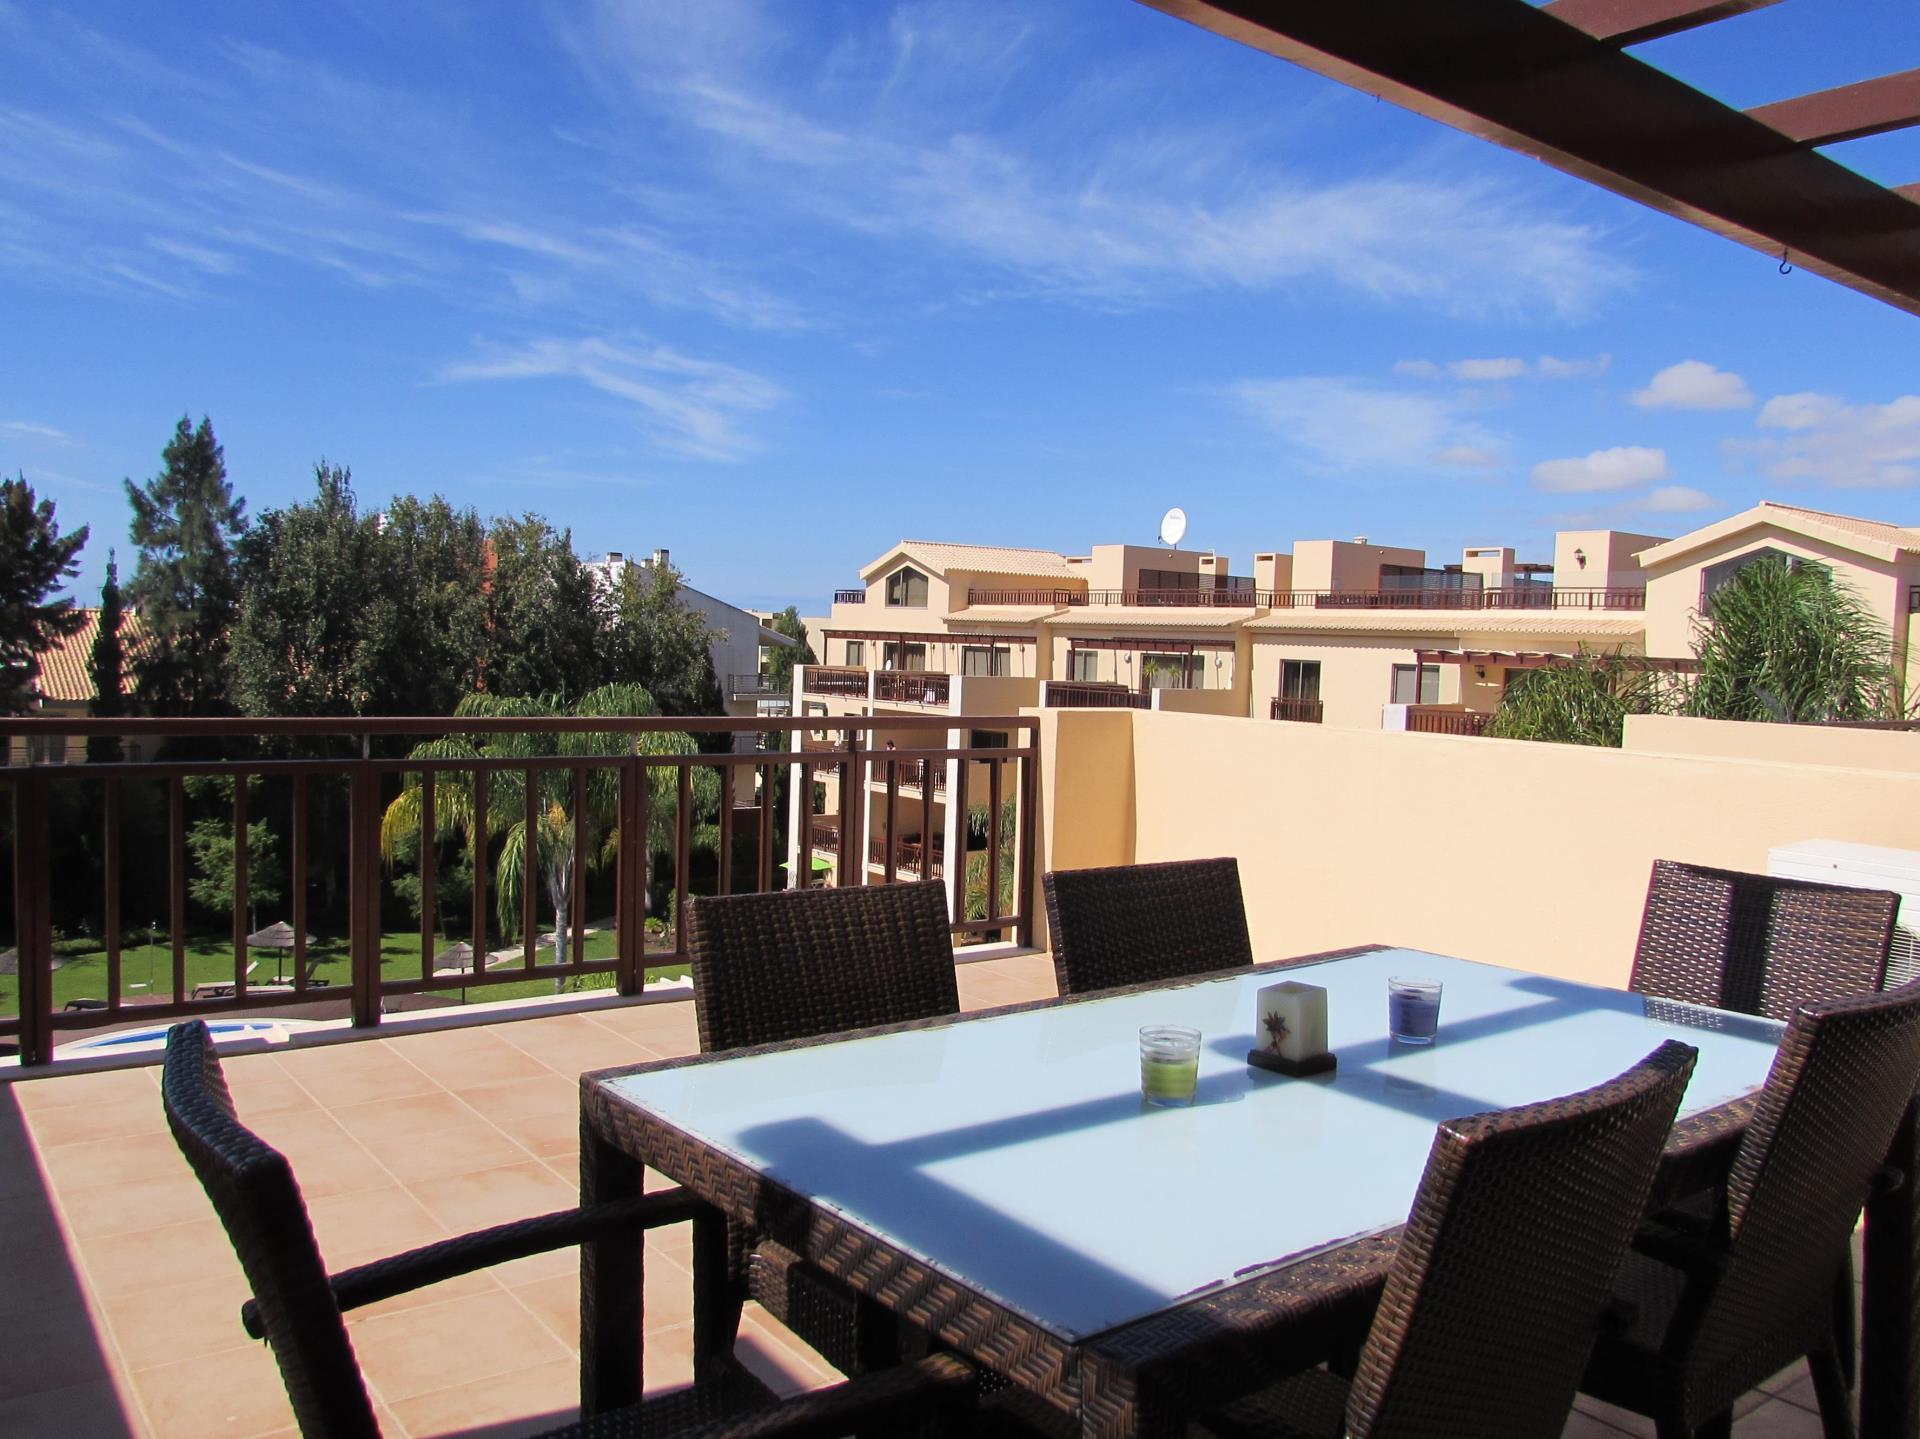 Duplex for Sale at Duplex, 3 bedrooms, for Sale Loule, Algarve Portugal